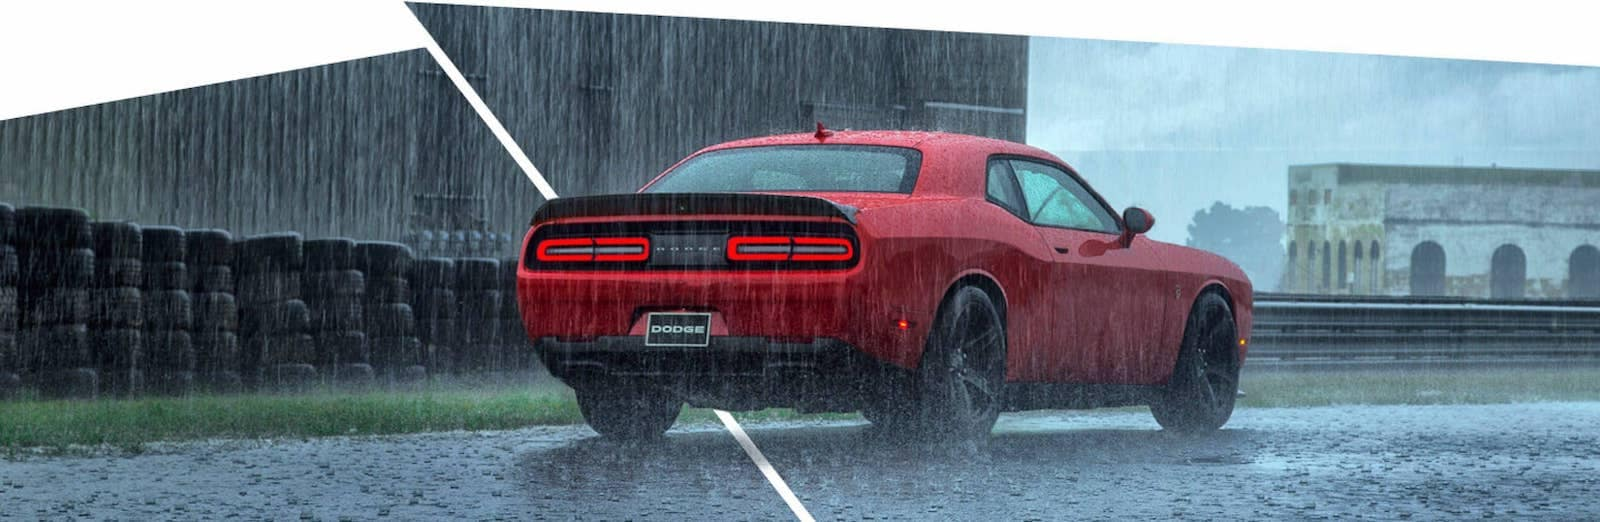 2021 Dodge Challenger rain brake support and rain-sensing windshield wipers